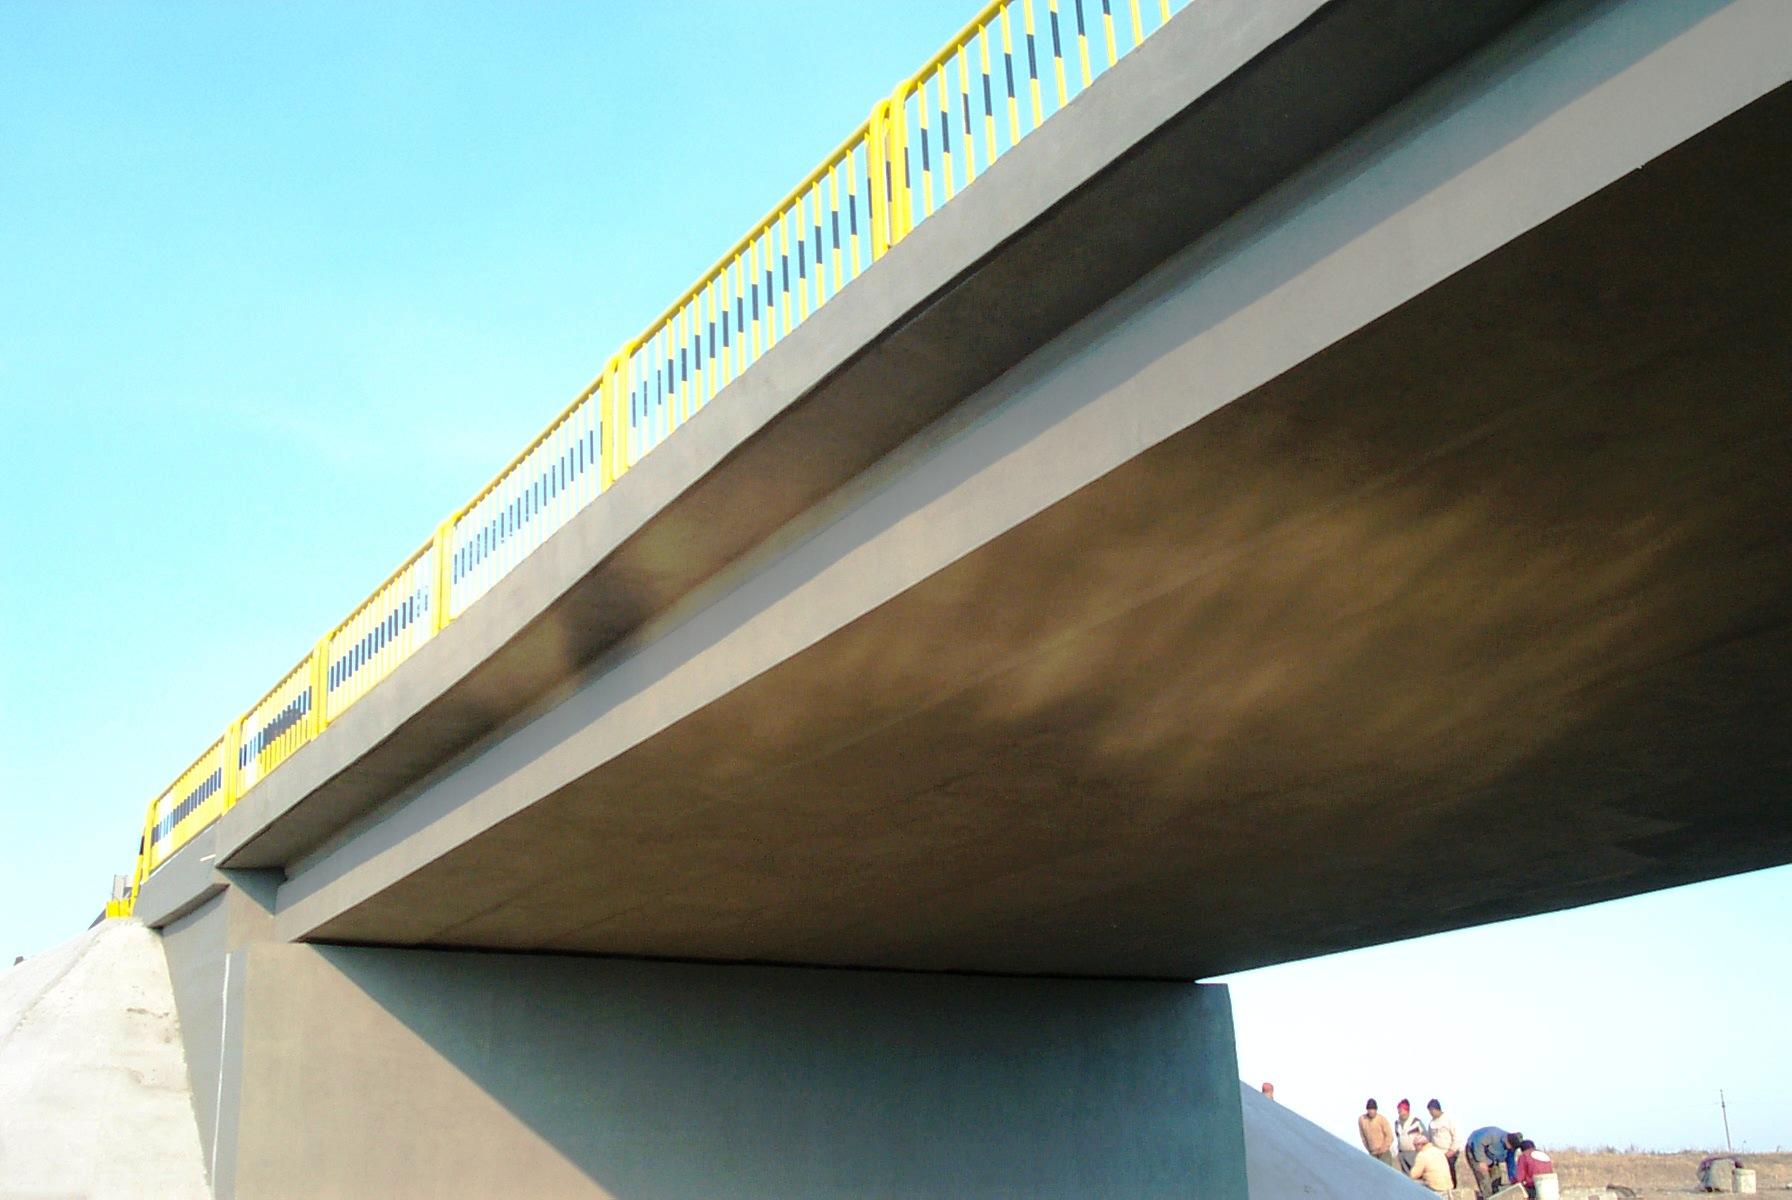 Reparatii pod (DN2), Km. 33 - 028, peste raul Calnistea MAPEI - Poza 26